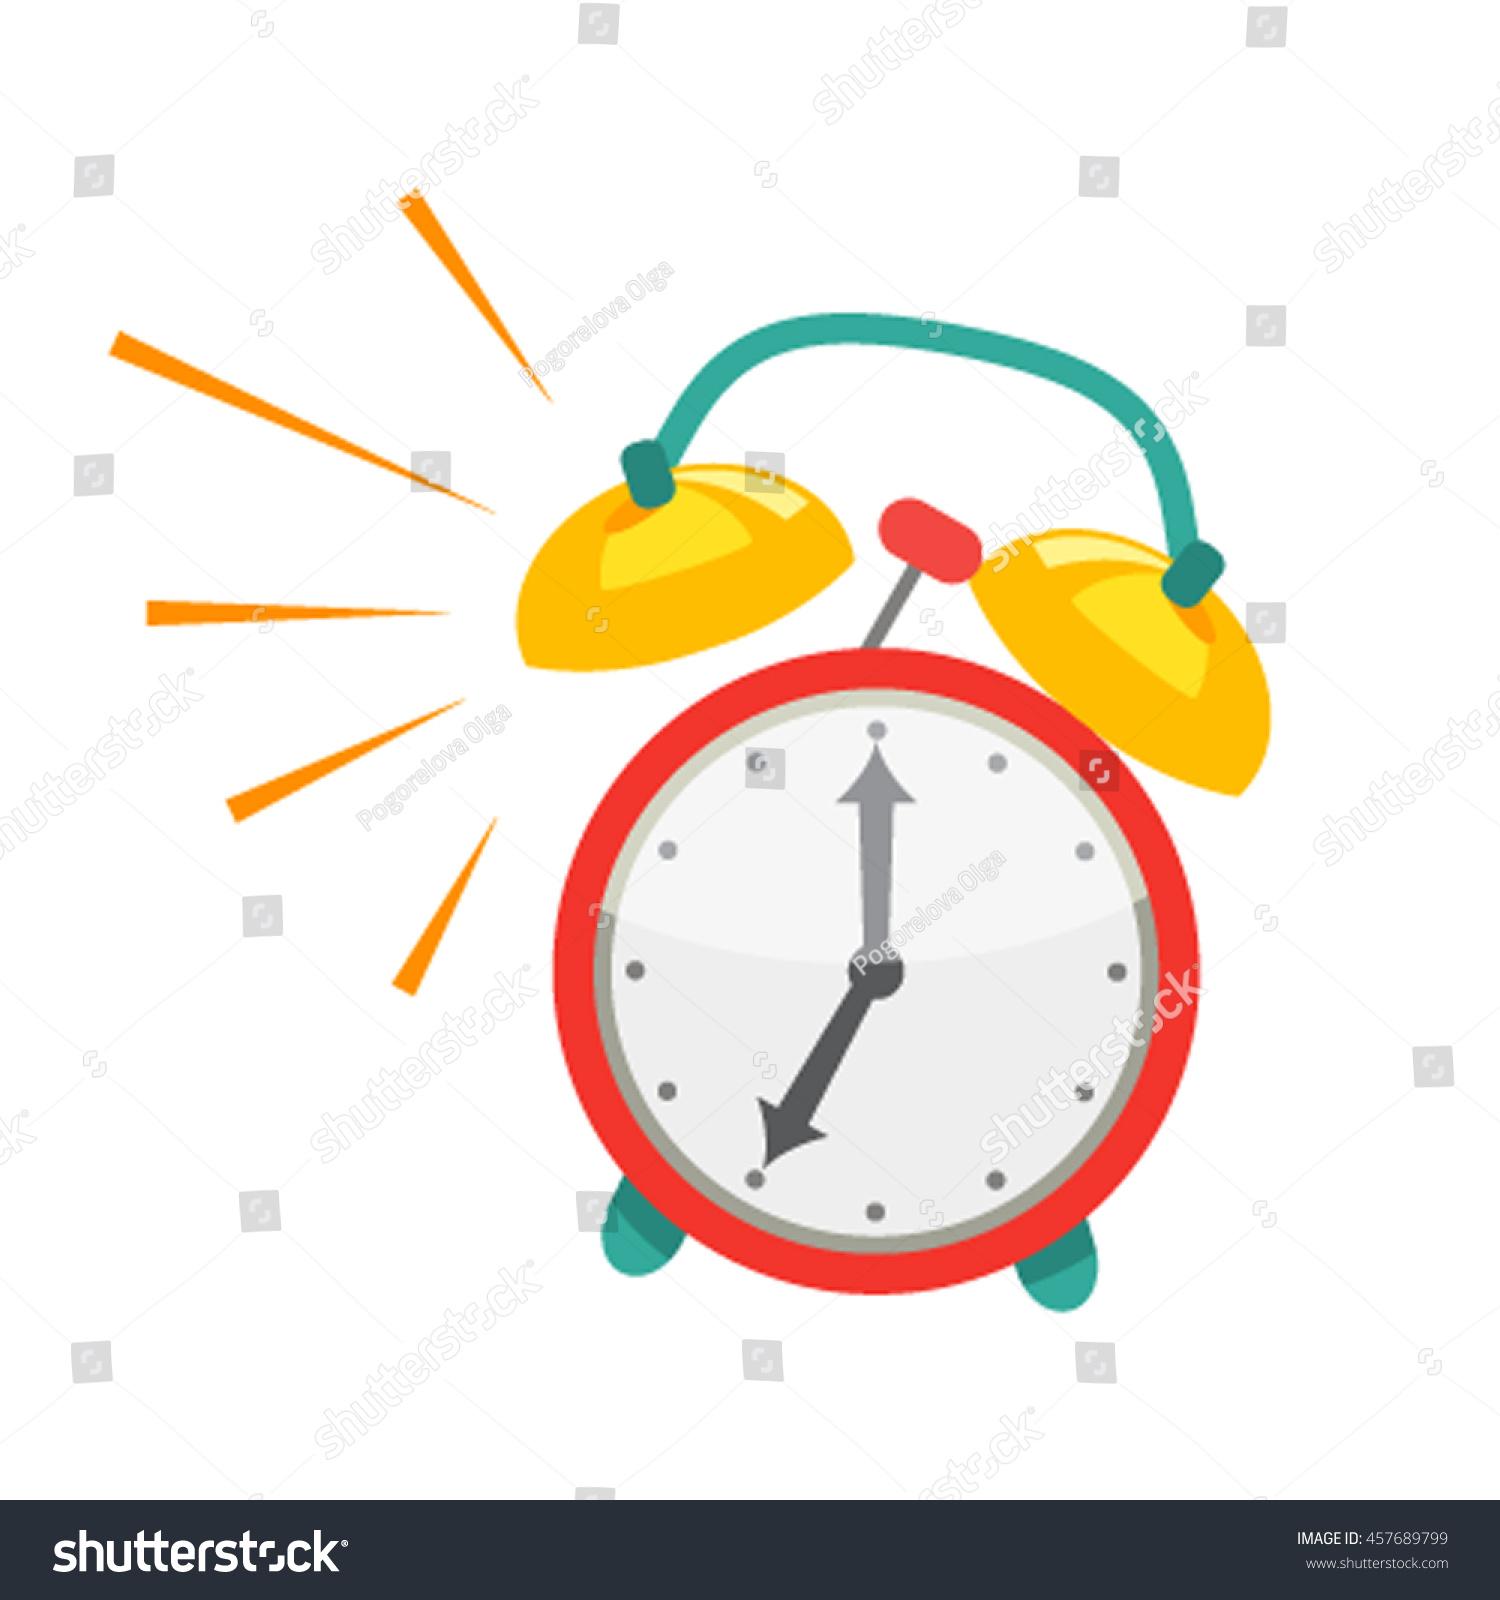 alarm clock wakeup time school work stock vector 2018 457689799 rh shutterstock com Alarm Clock Clip Art Blank Clock Clip Art